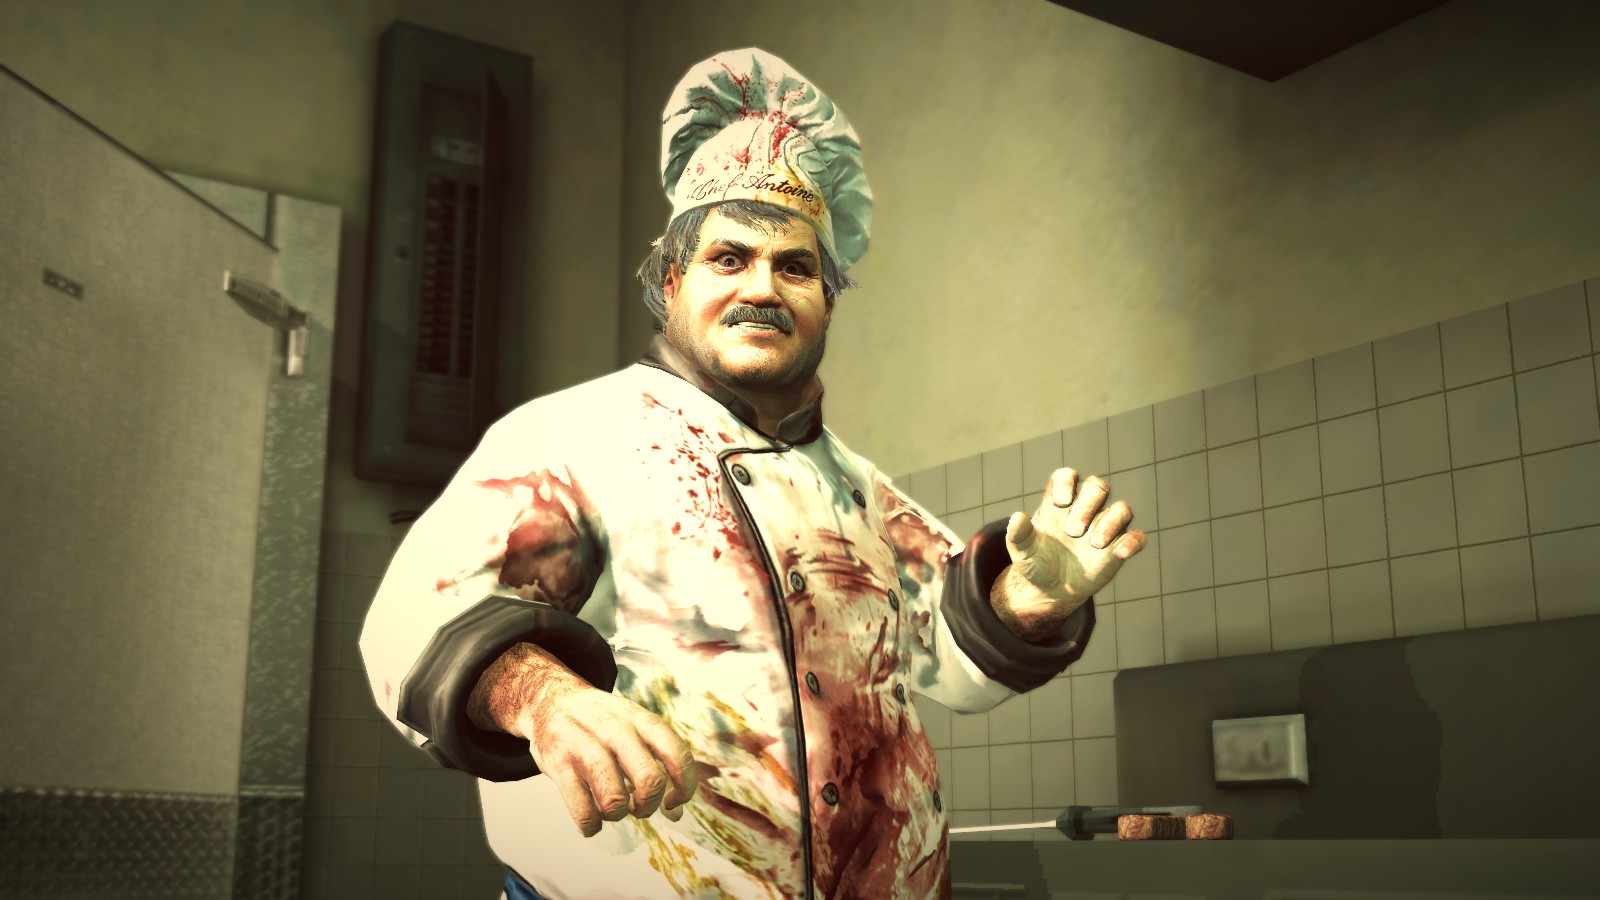 Chef Antoine Dead Rising 2